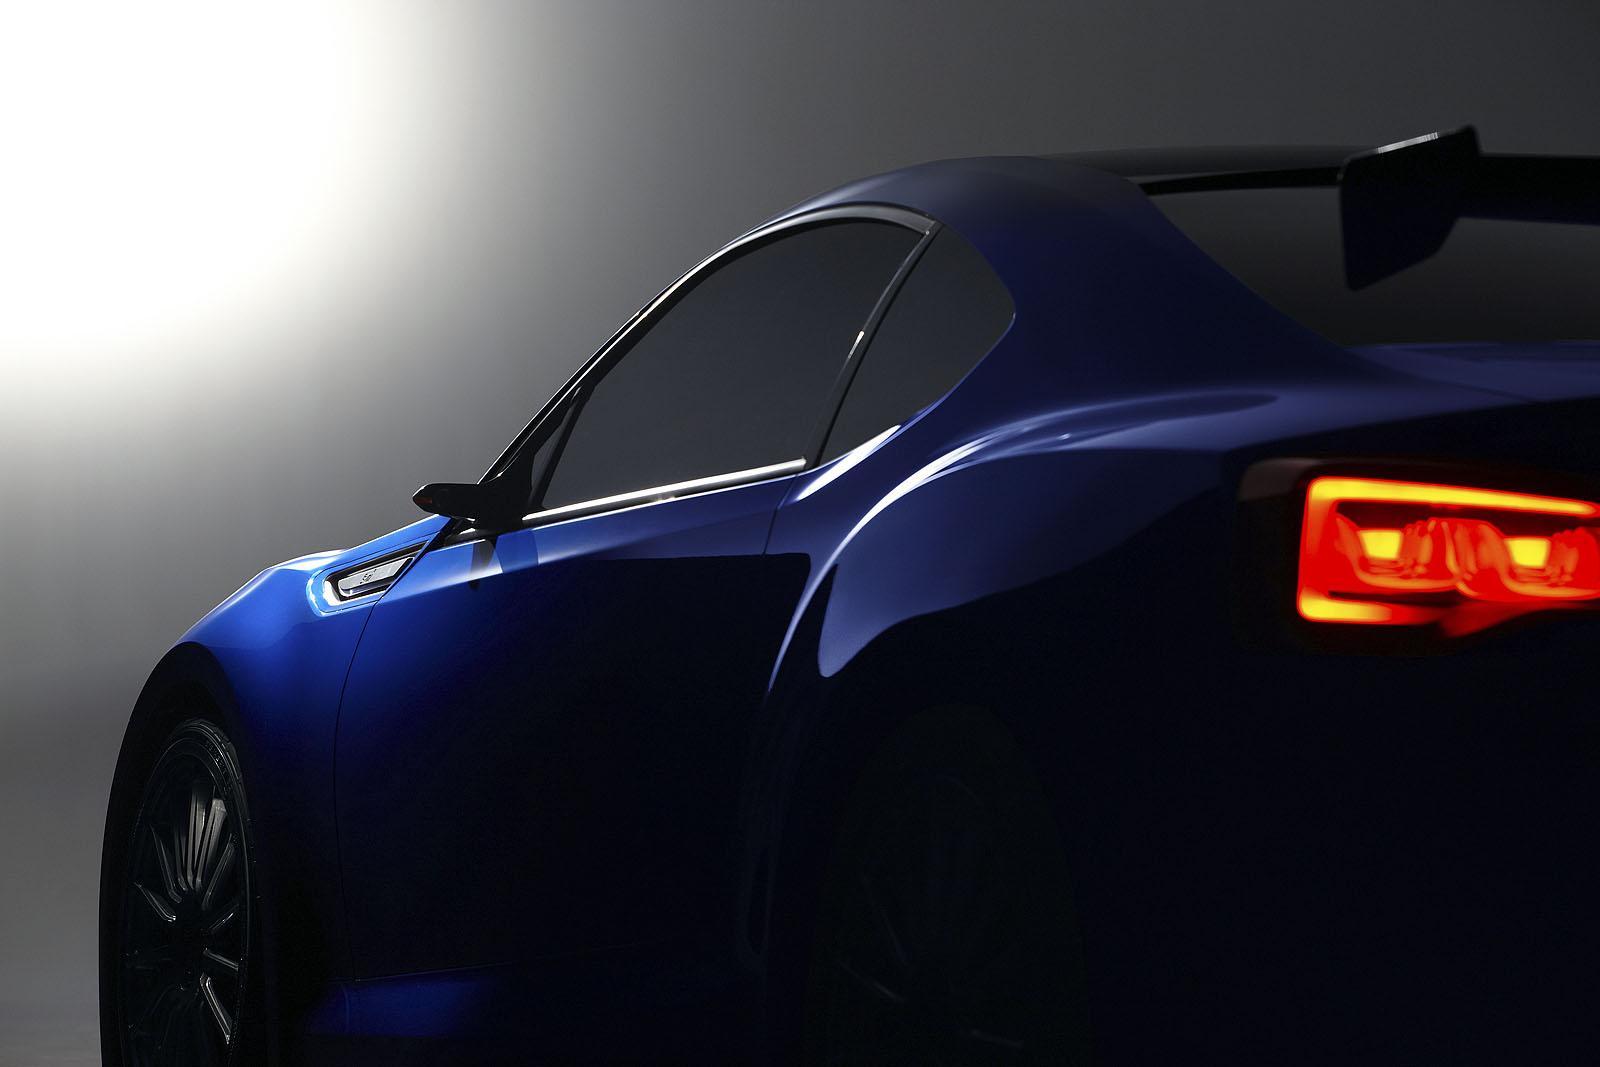 Subaru Cars News 171kw Brz Sti To Be Naturally Aspirated